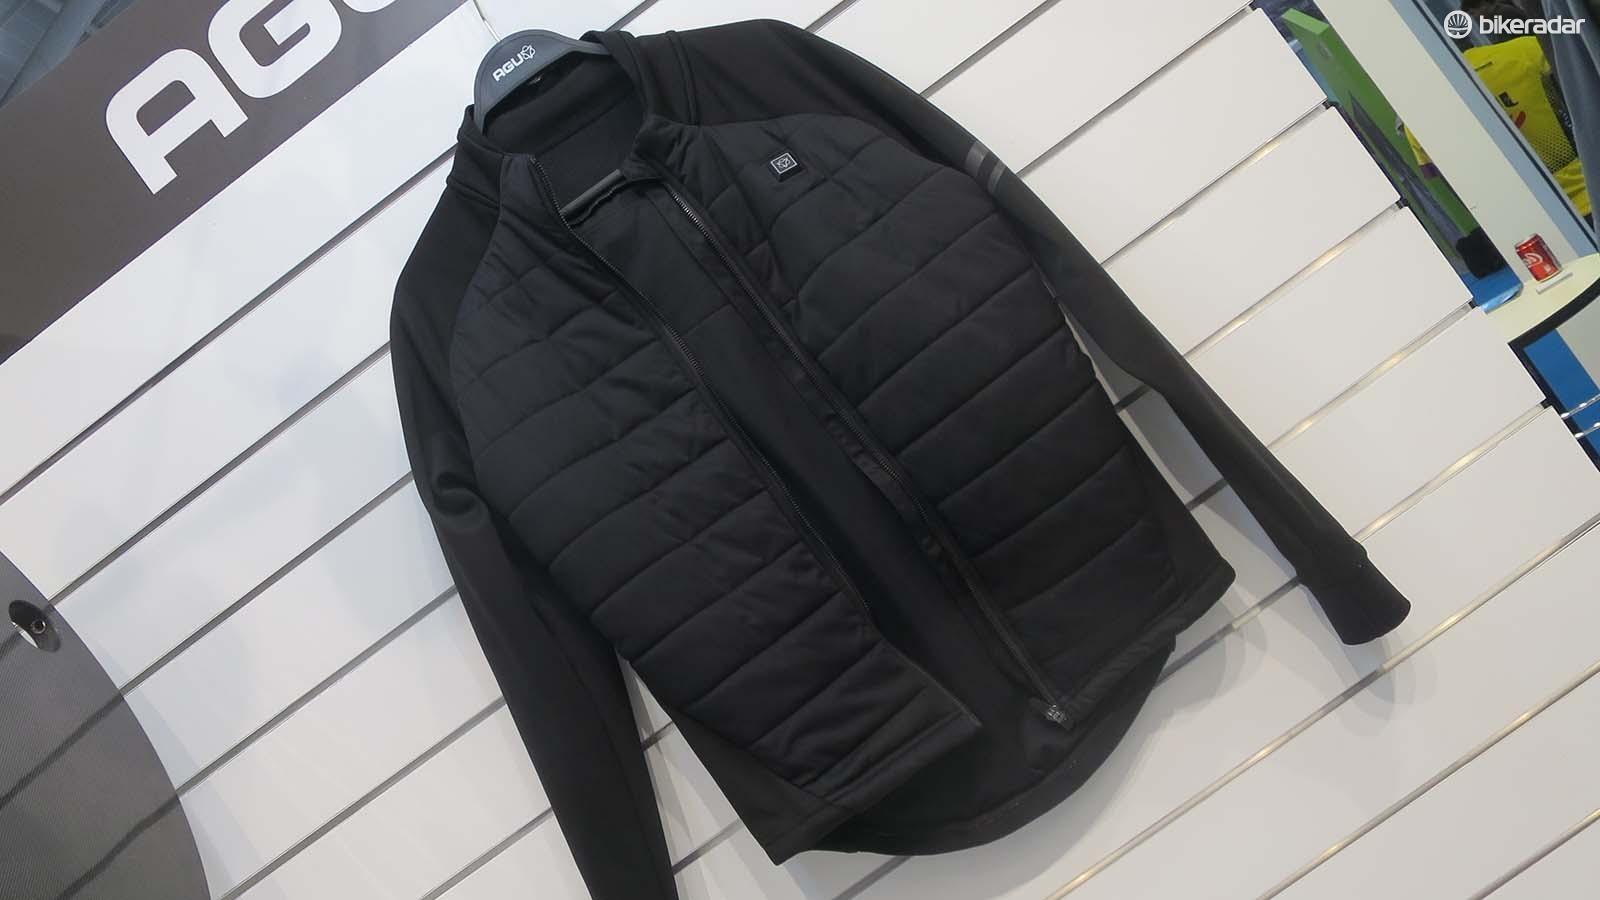 AGU's deep winter jacket looks like your average primaloft padded winter top